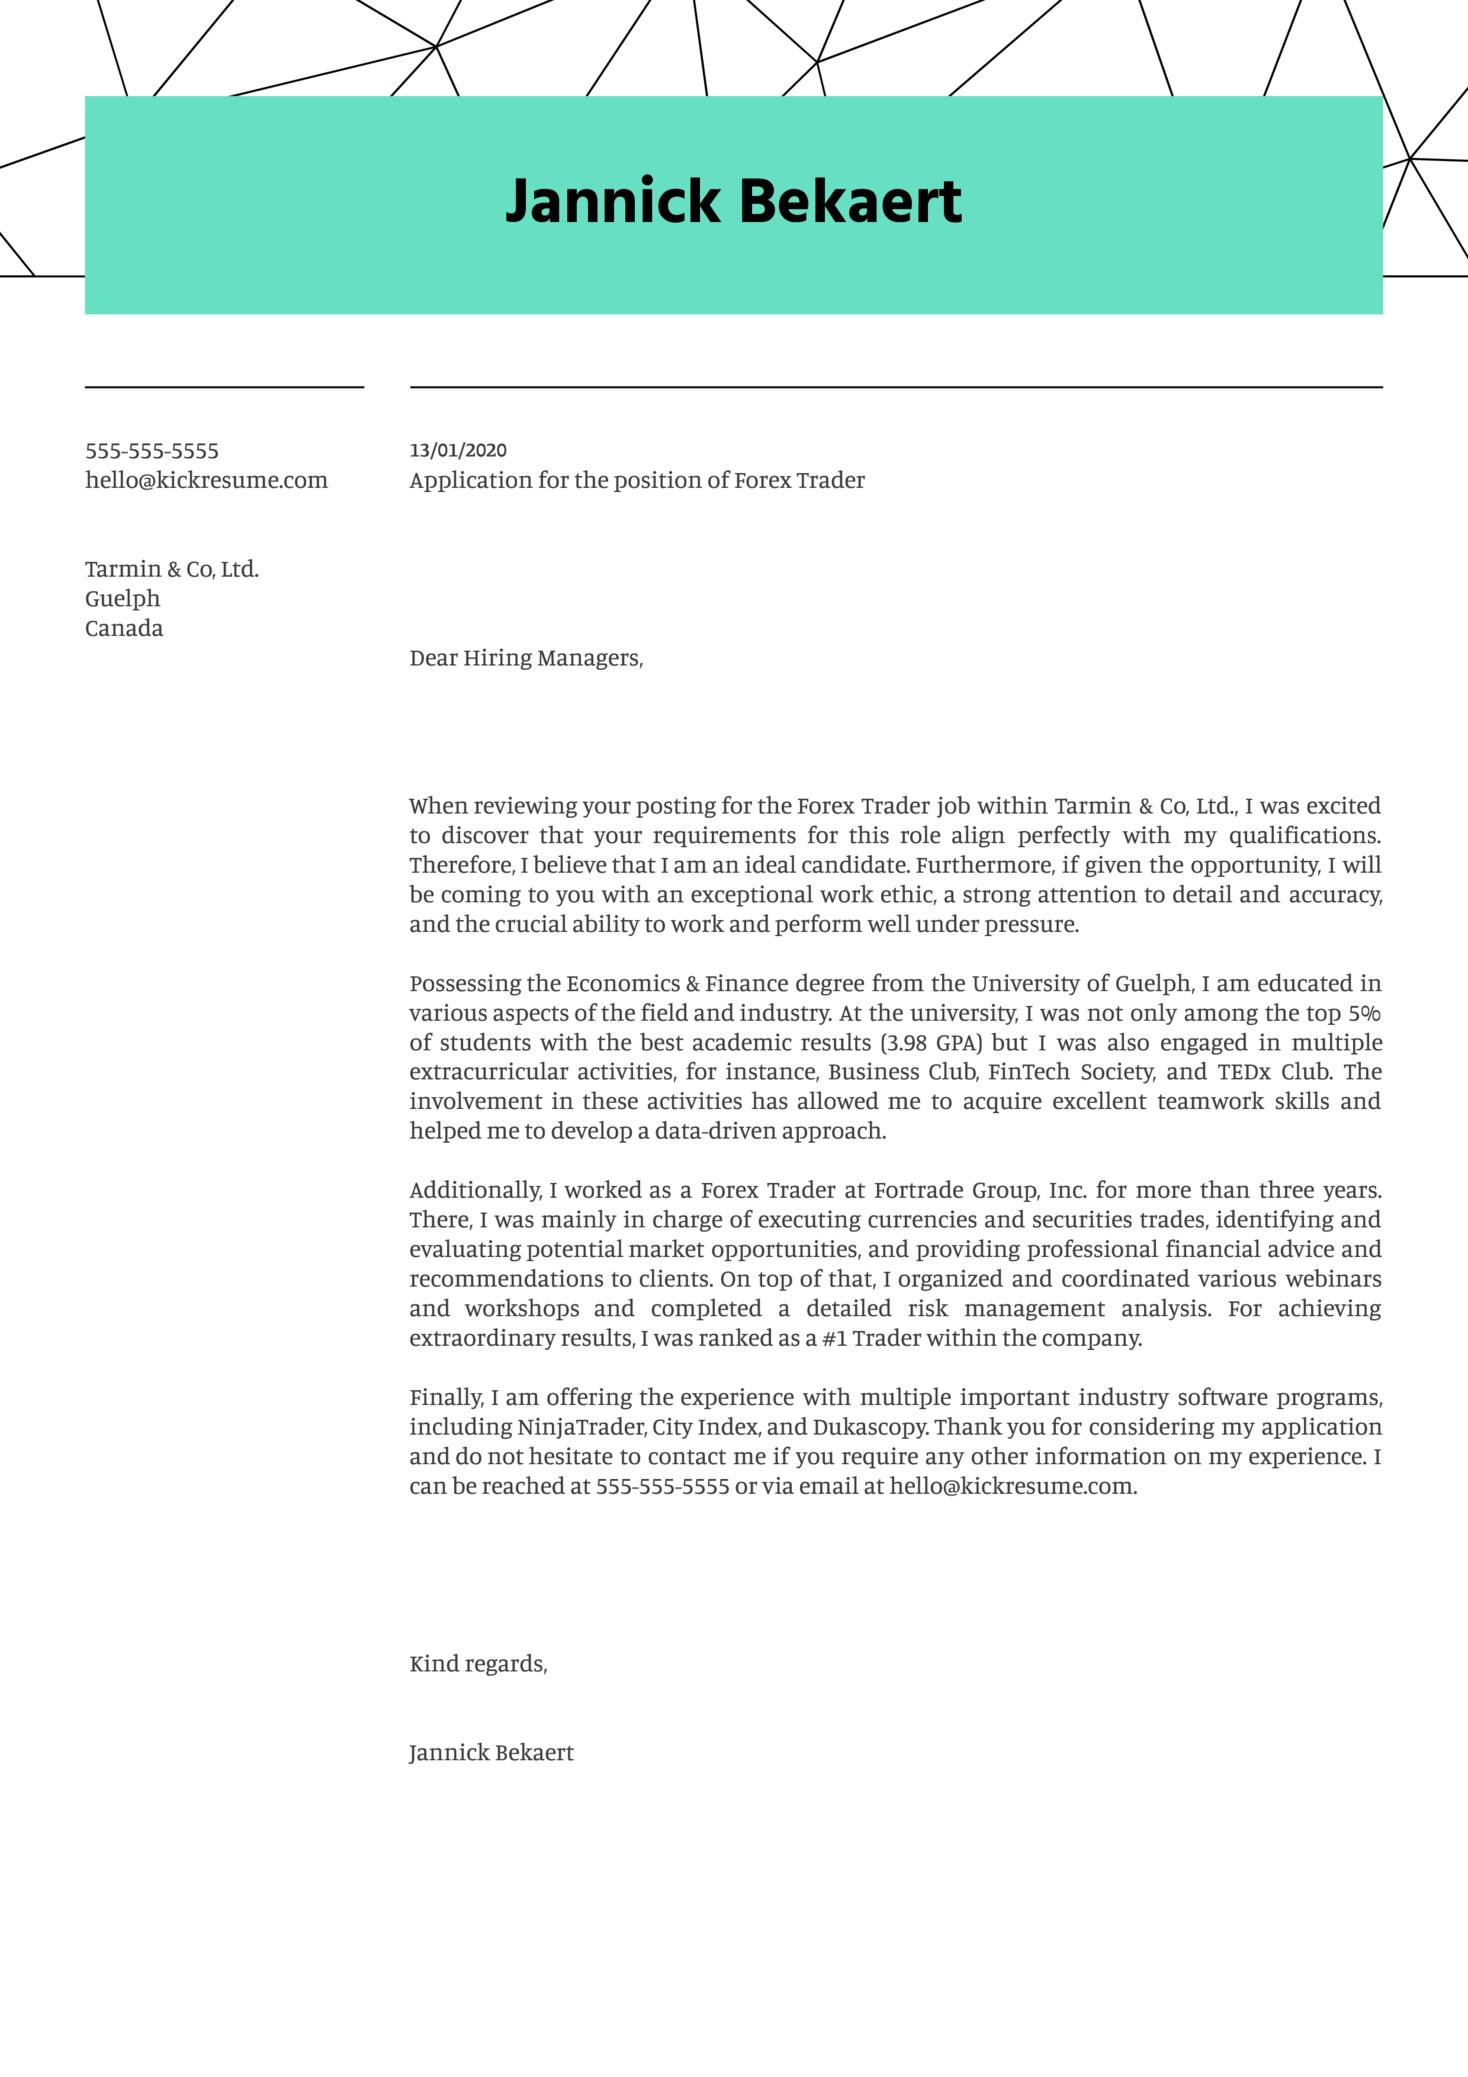 Cover letter for forex trader